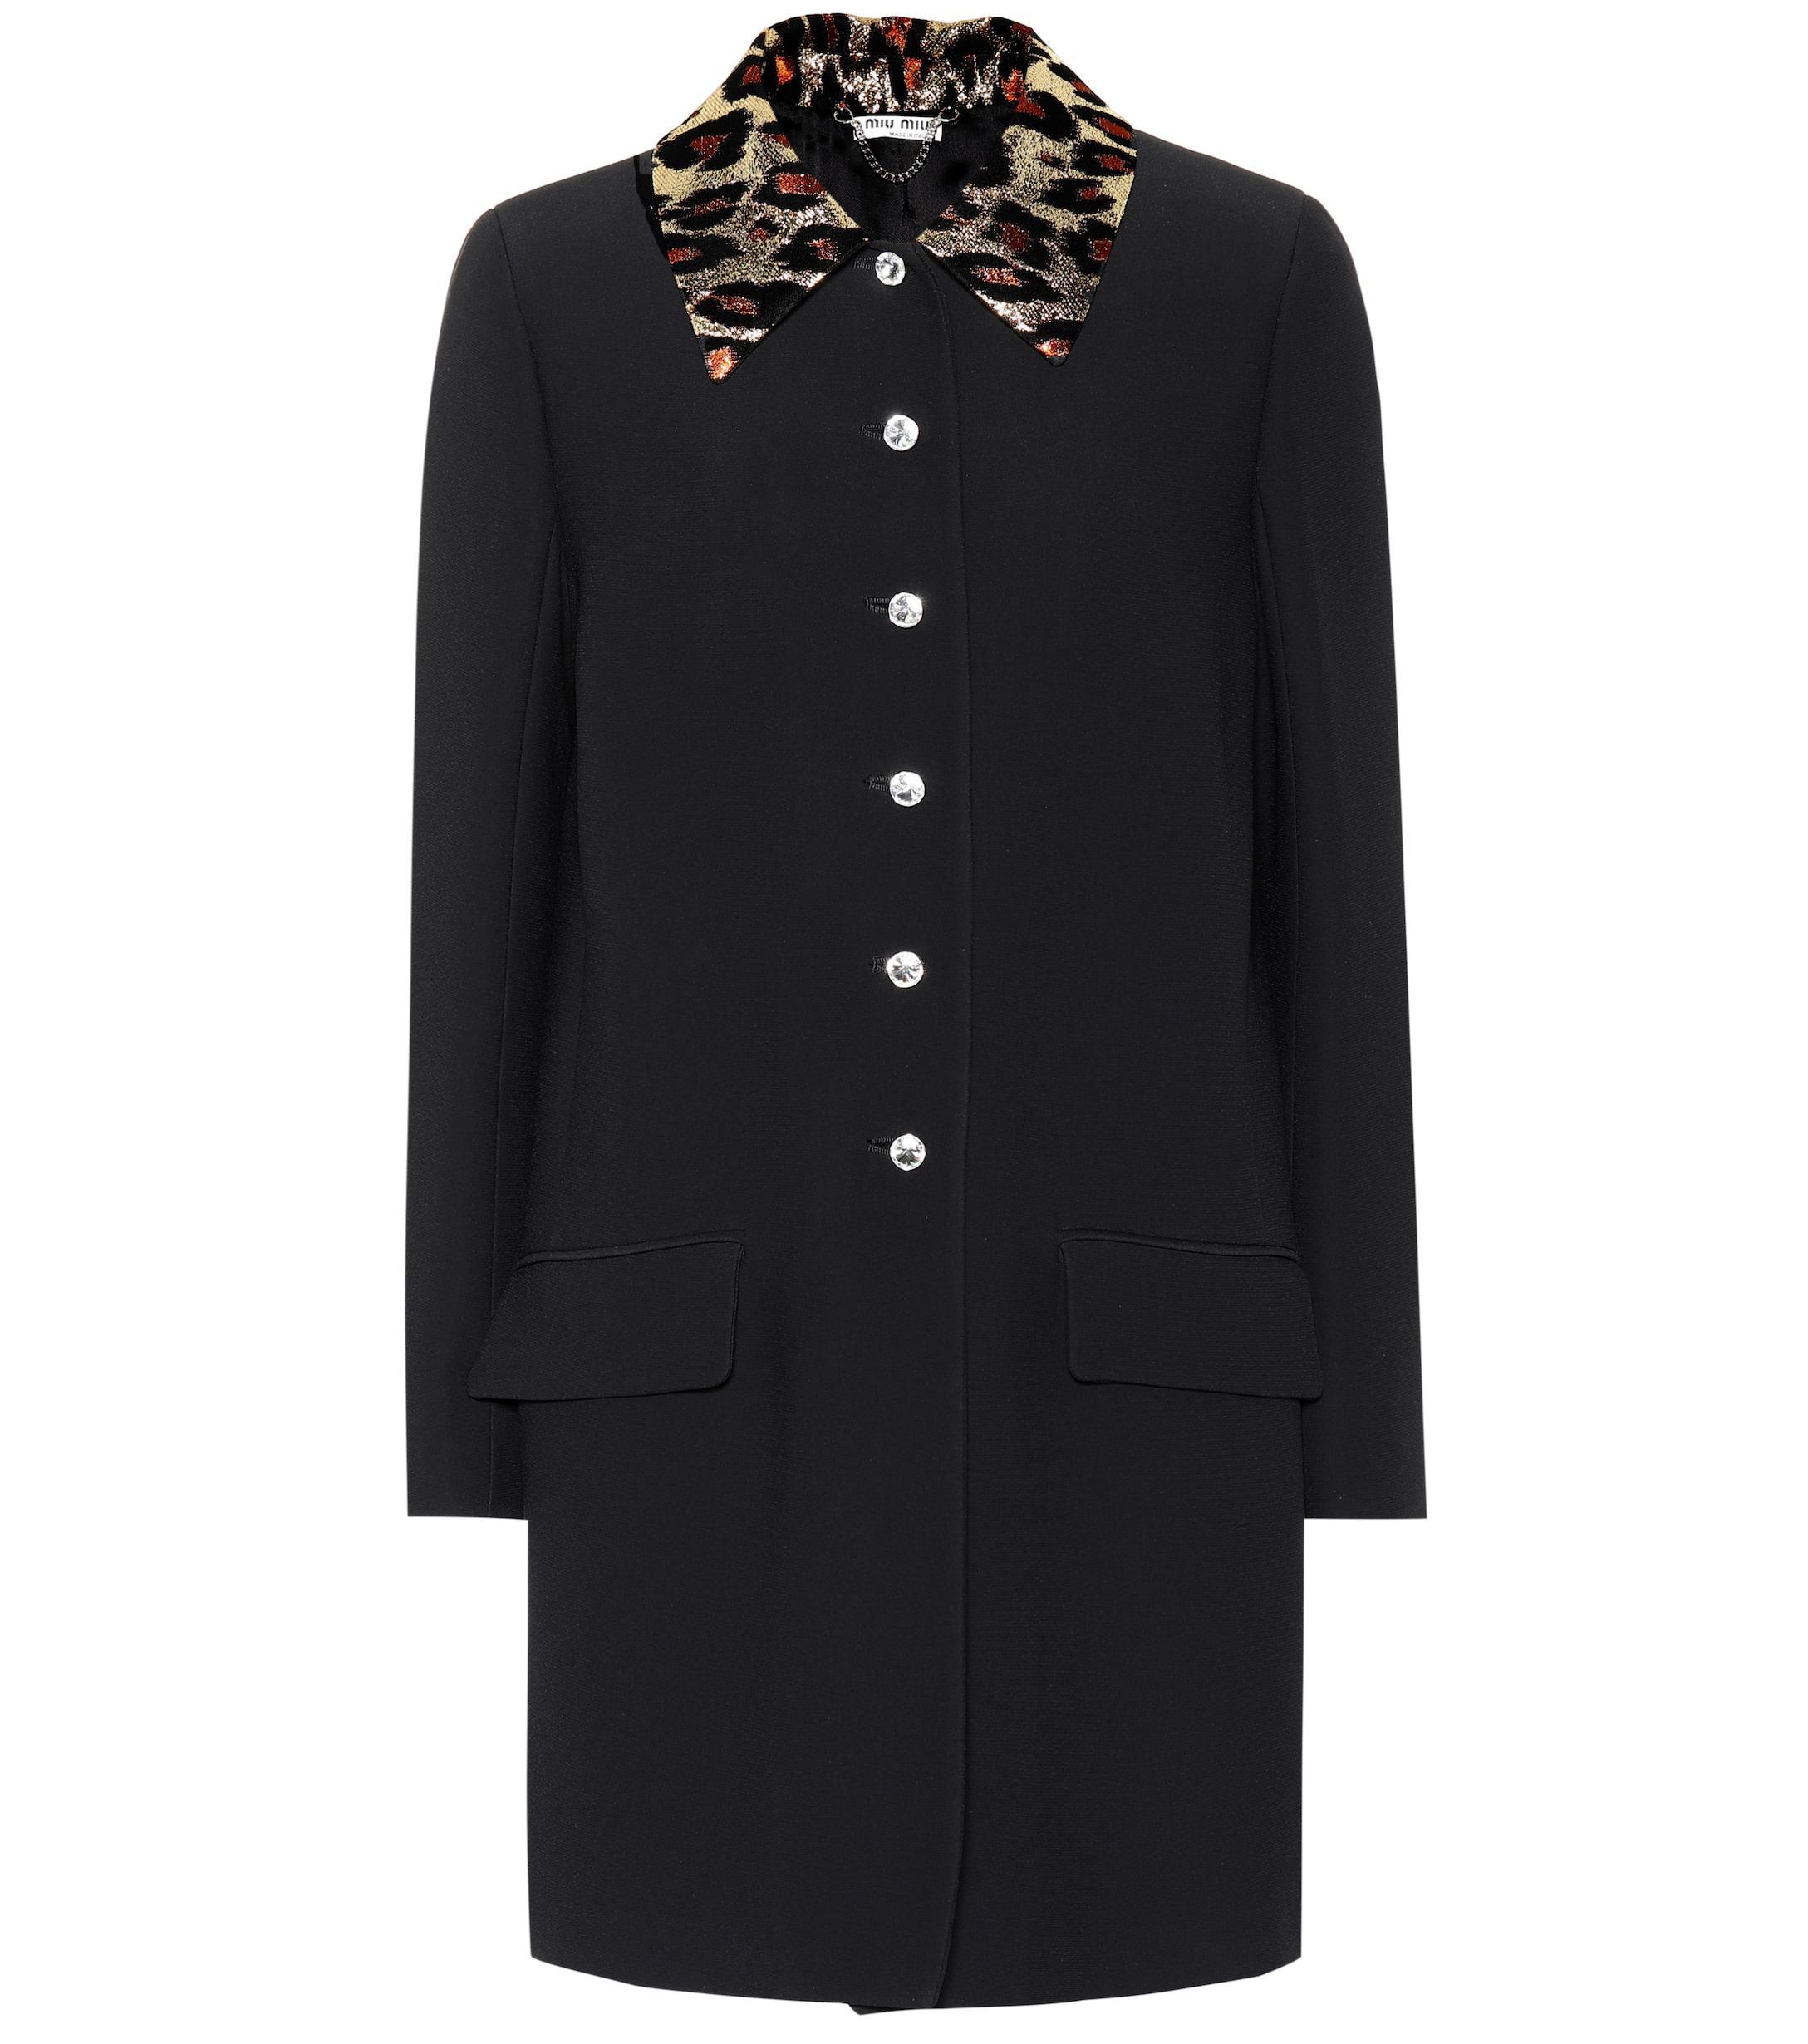 1b9503d8bddc Lyst - Miu Miu Crystal Embellished Coat in Black